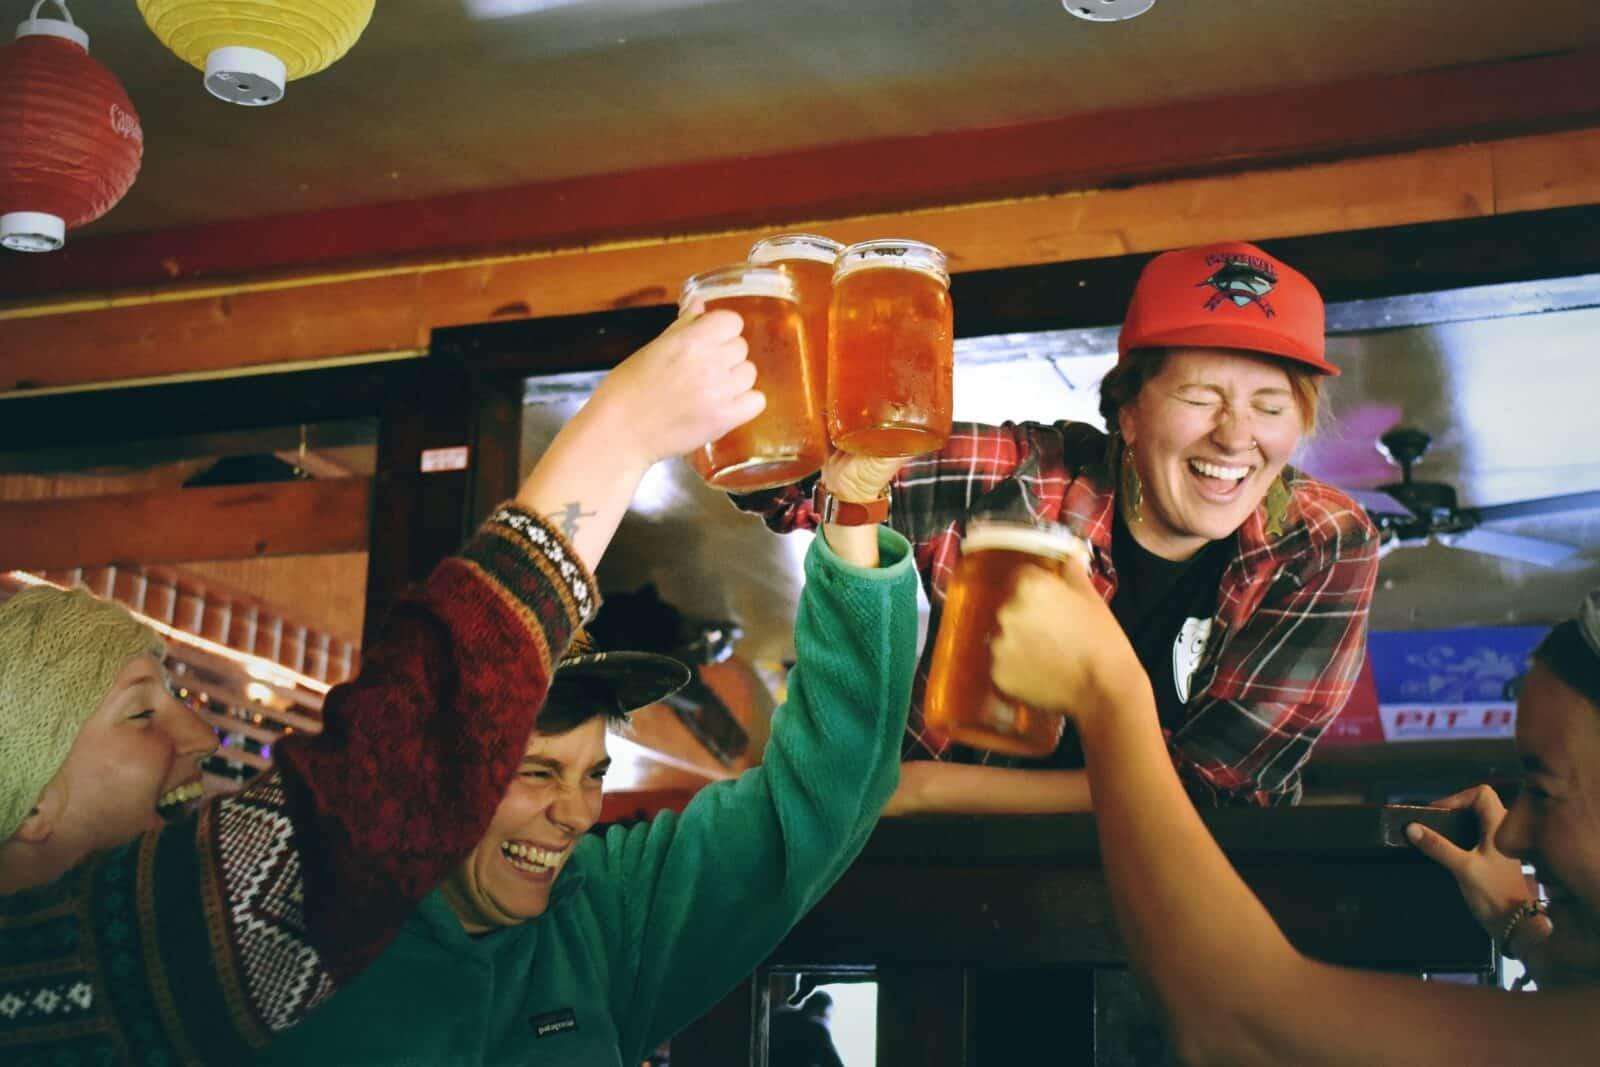 Binge drinking, EtG strips, people drinking beer